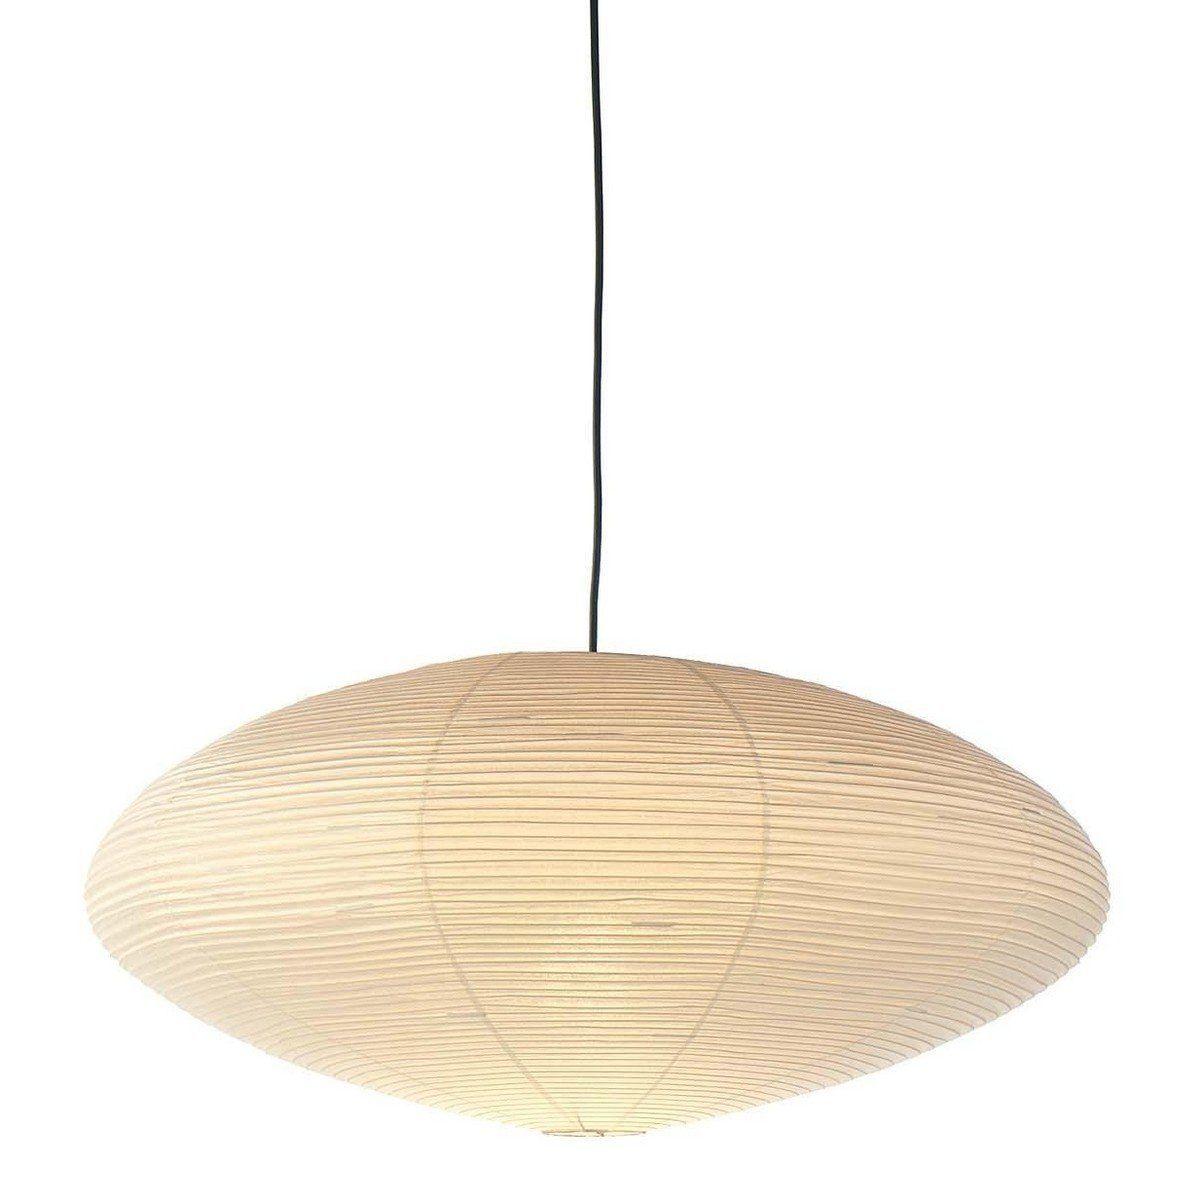 vitra lighting. Vitra - Akari 21A Suspension Lamp Lighting